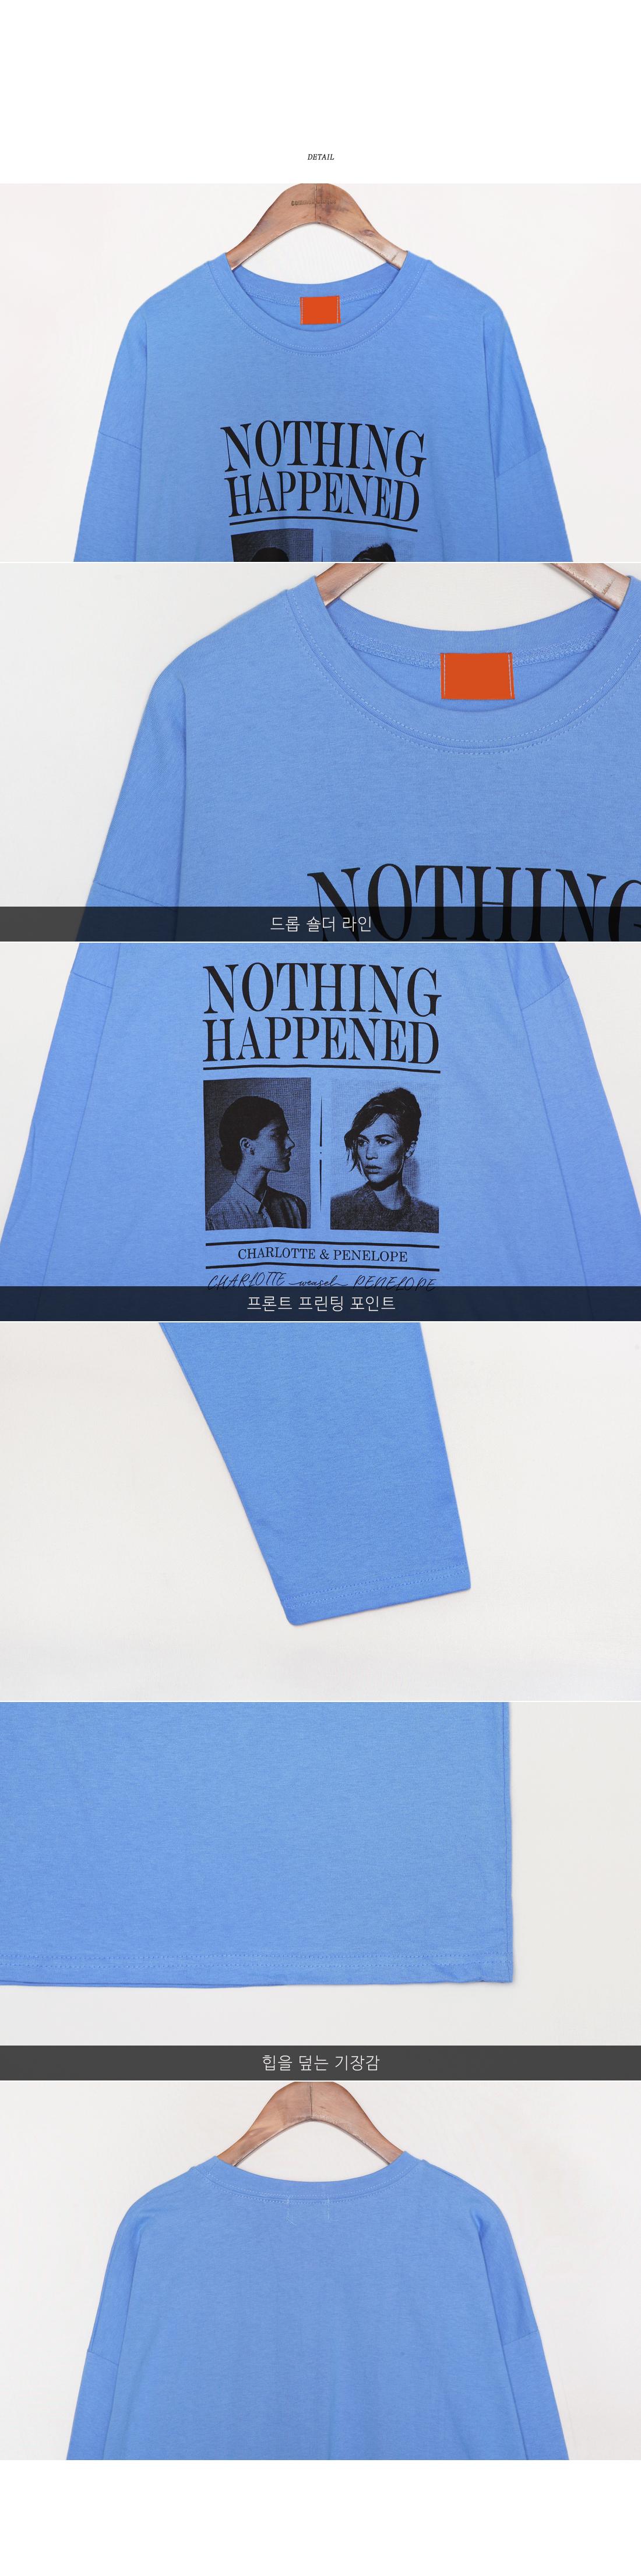 [TOP] NOTHING GIRL PRINTING T